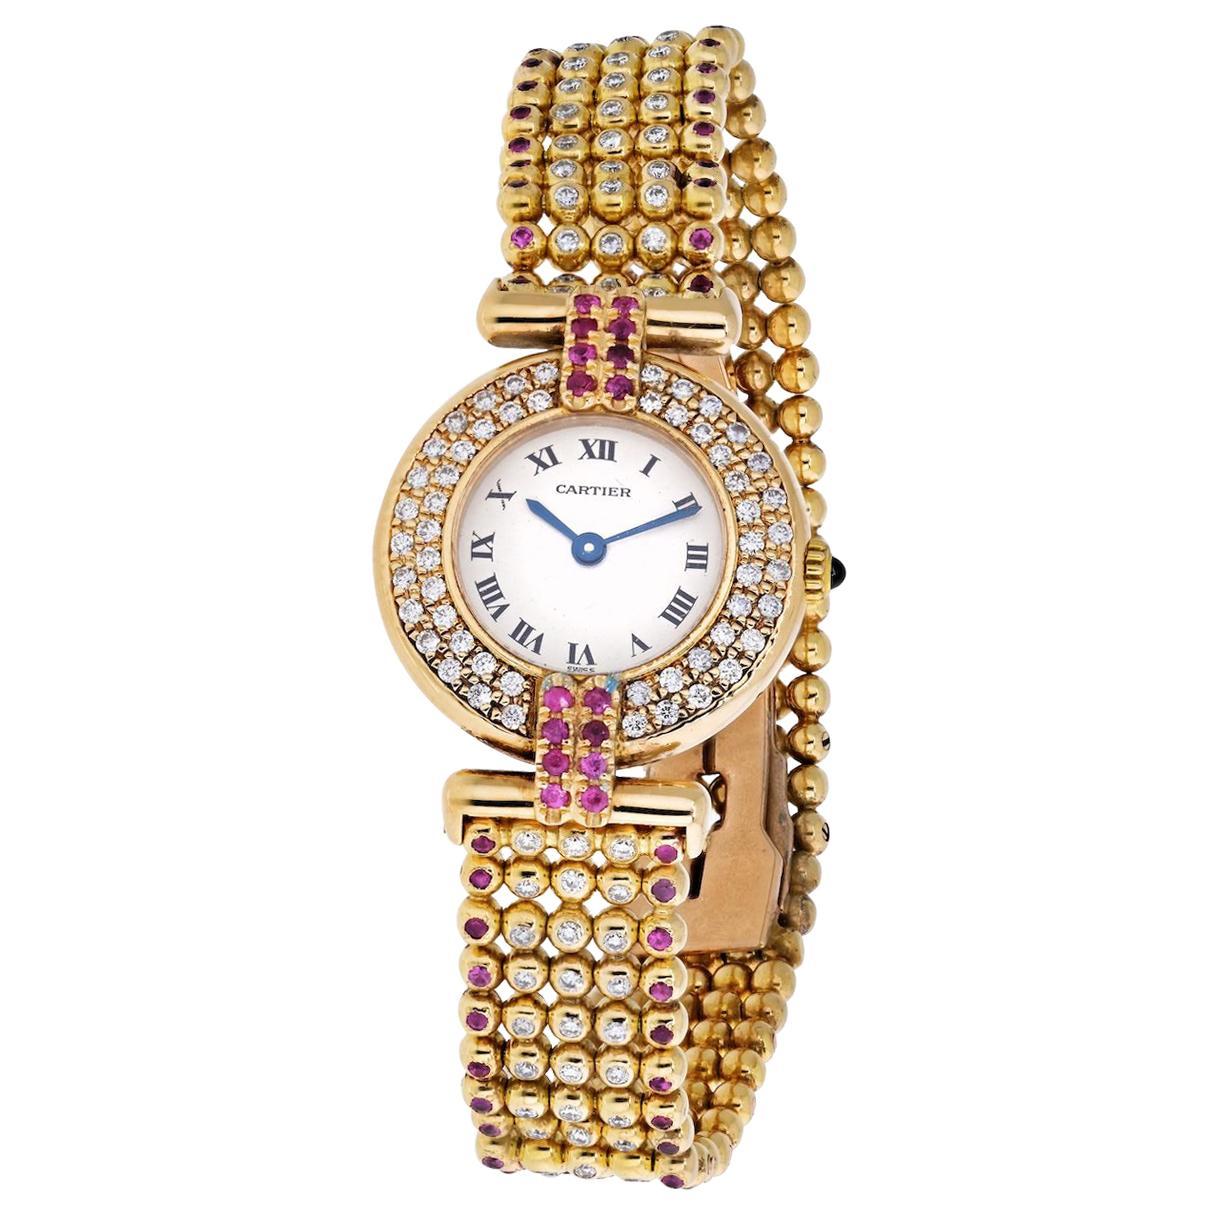 Cartier Rivoli 18 Karat Yellow Gold 1292 Diamonds and Ruby Ladies Watch